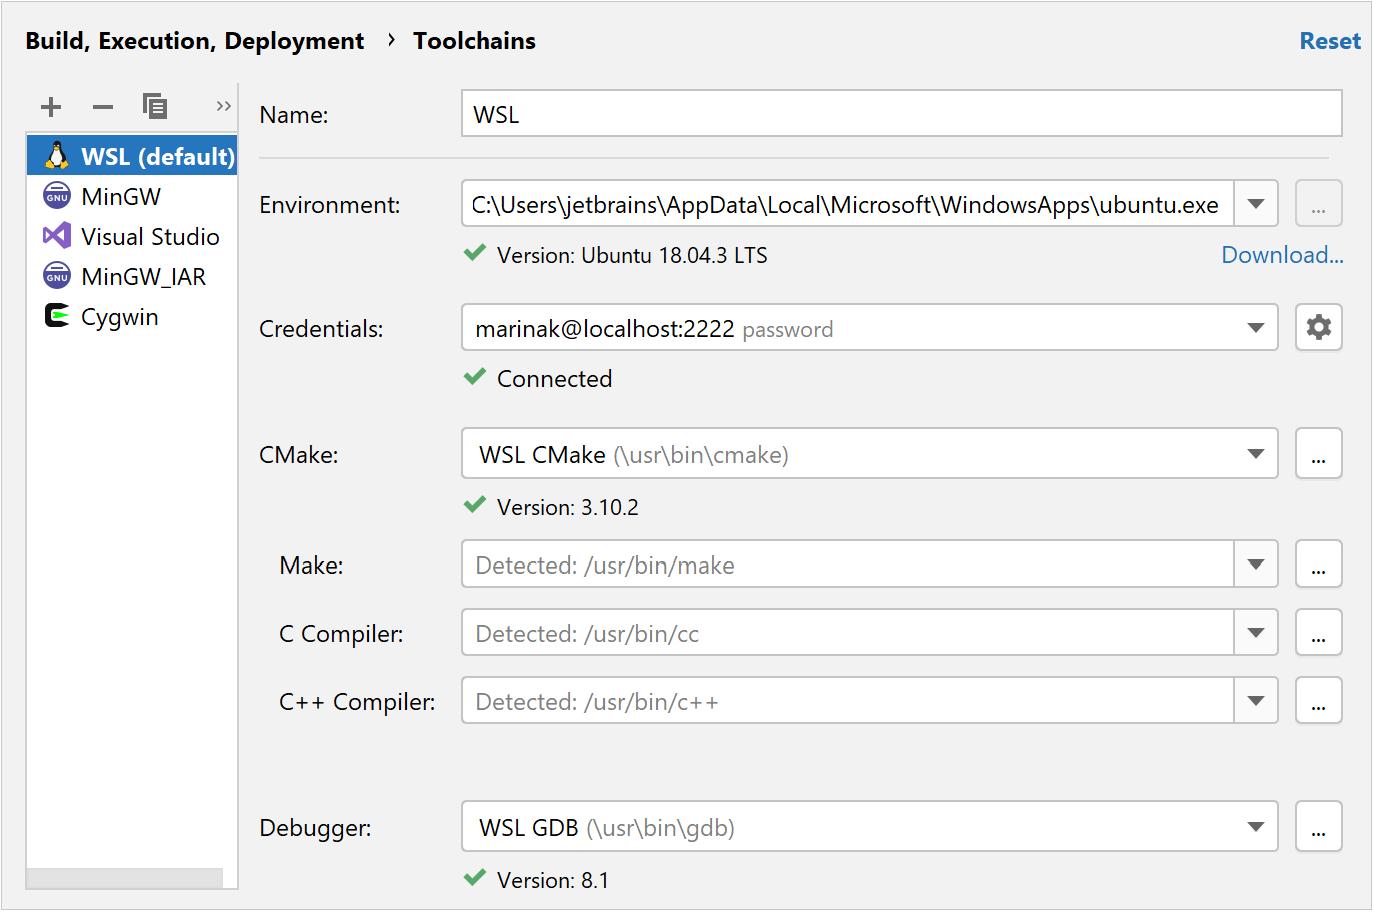 WSL toolchain